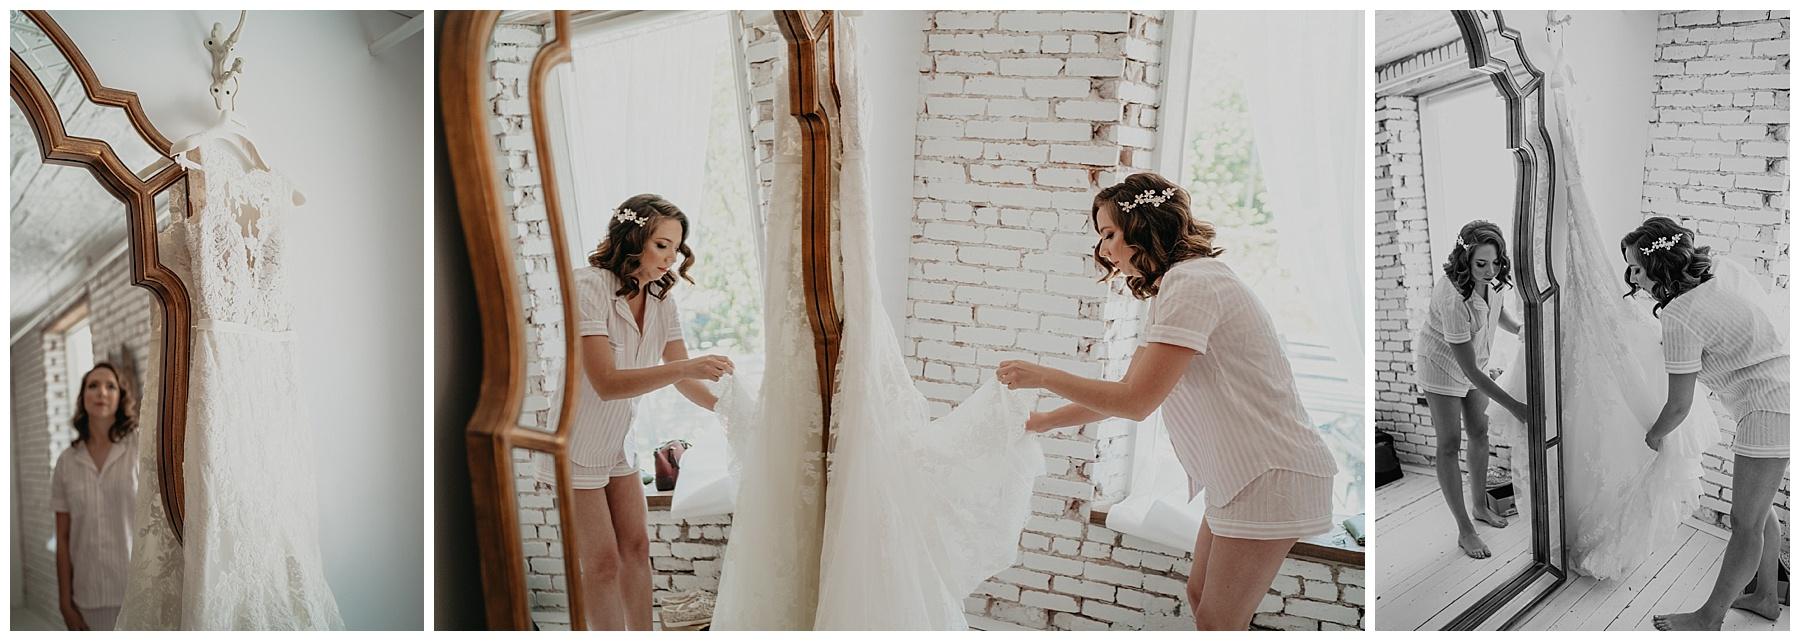 the_ravington_wedding_arkansas_0007.jpg